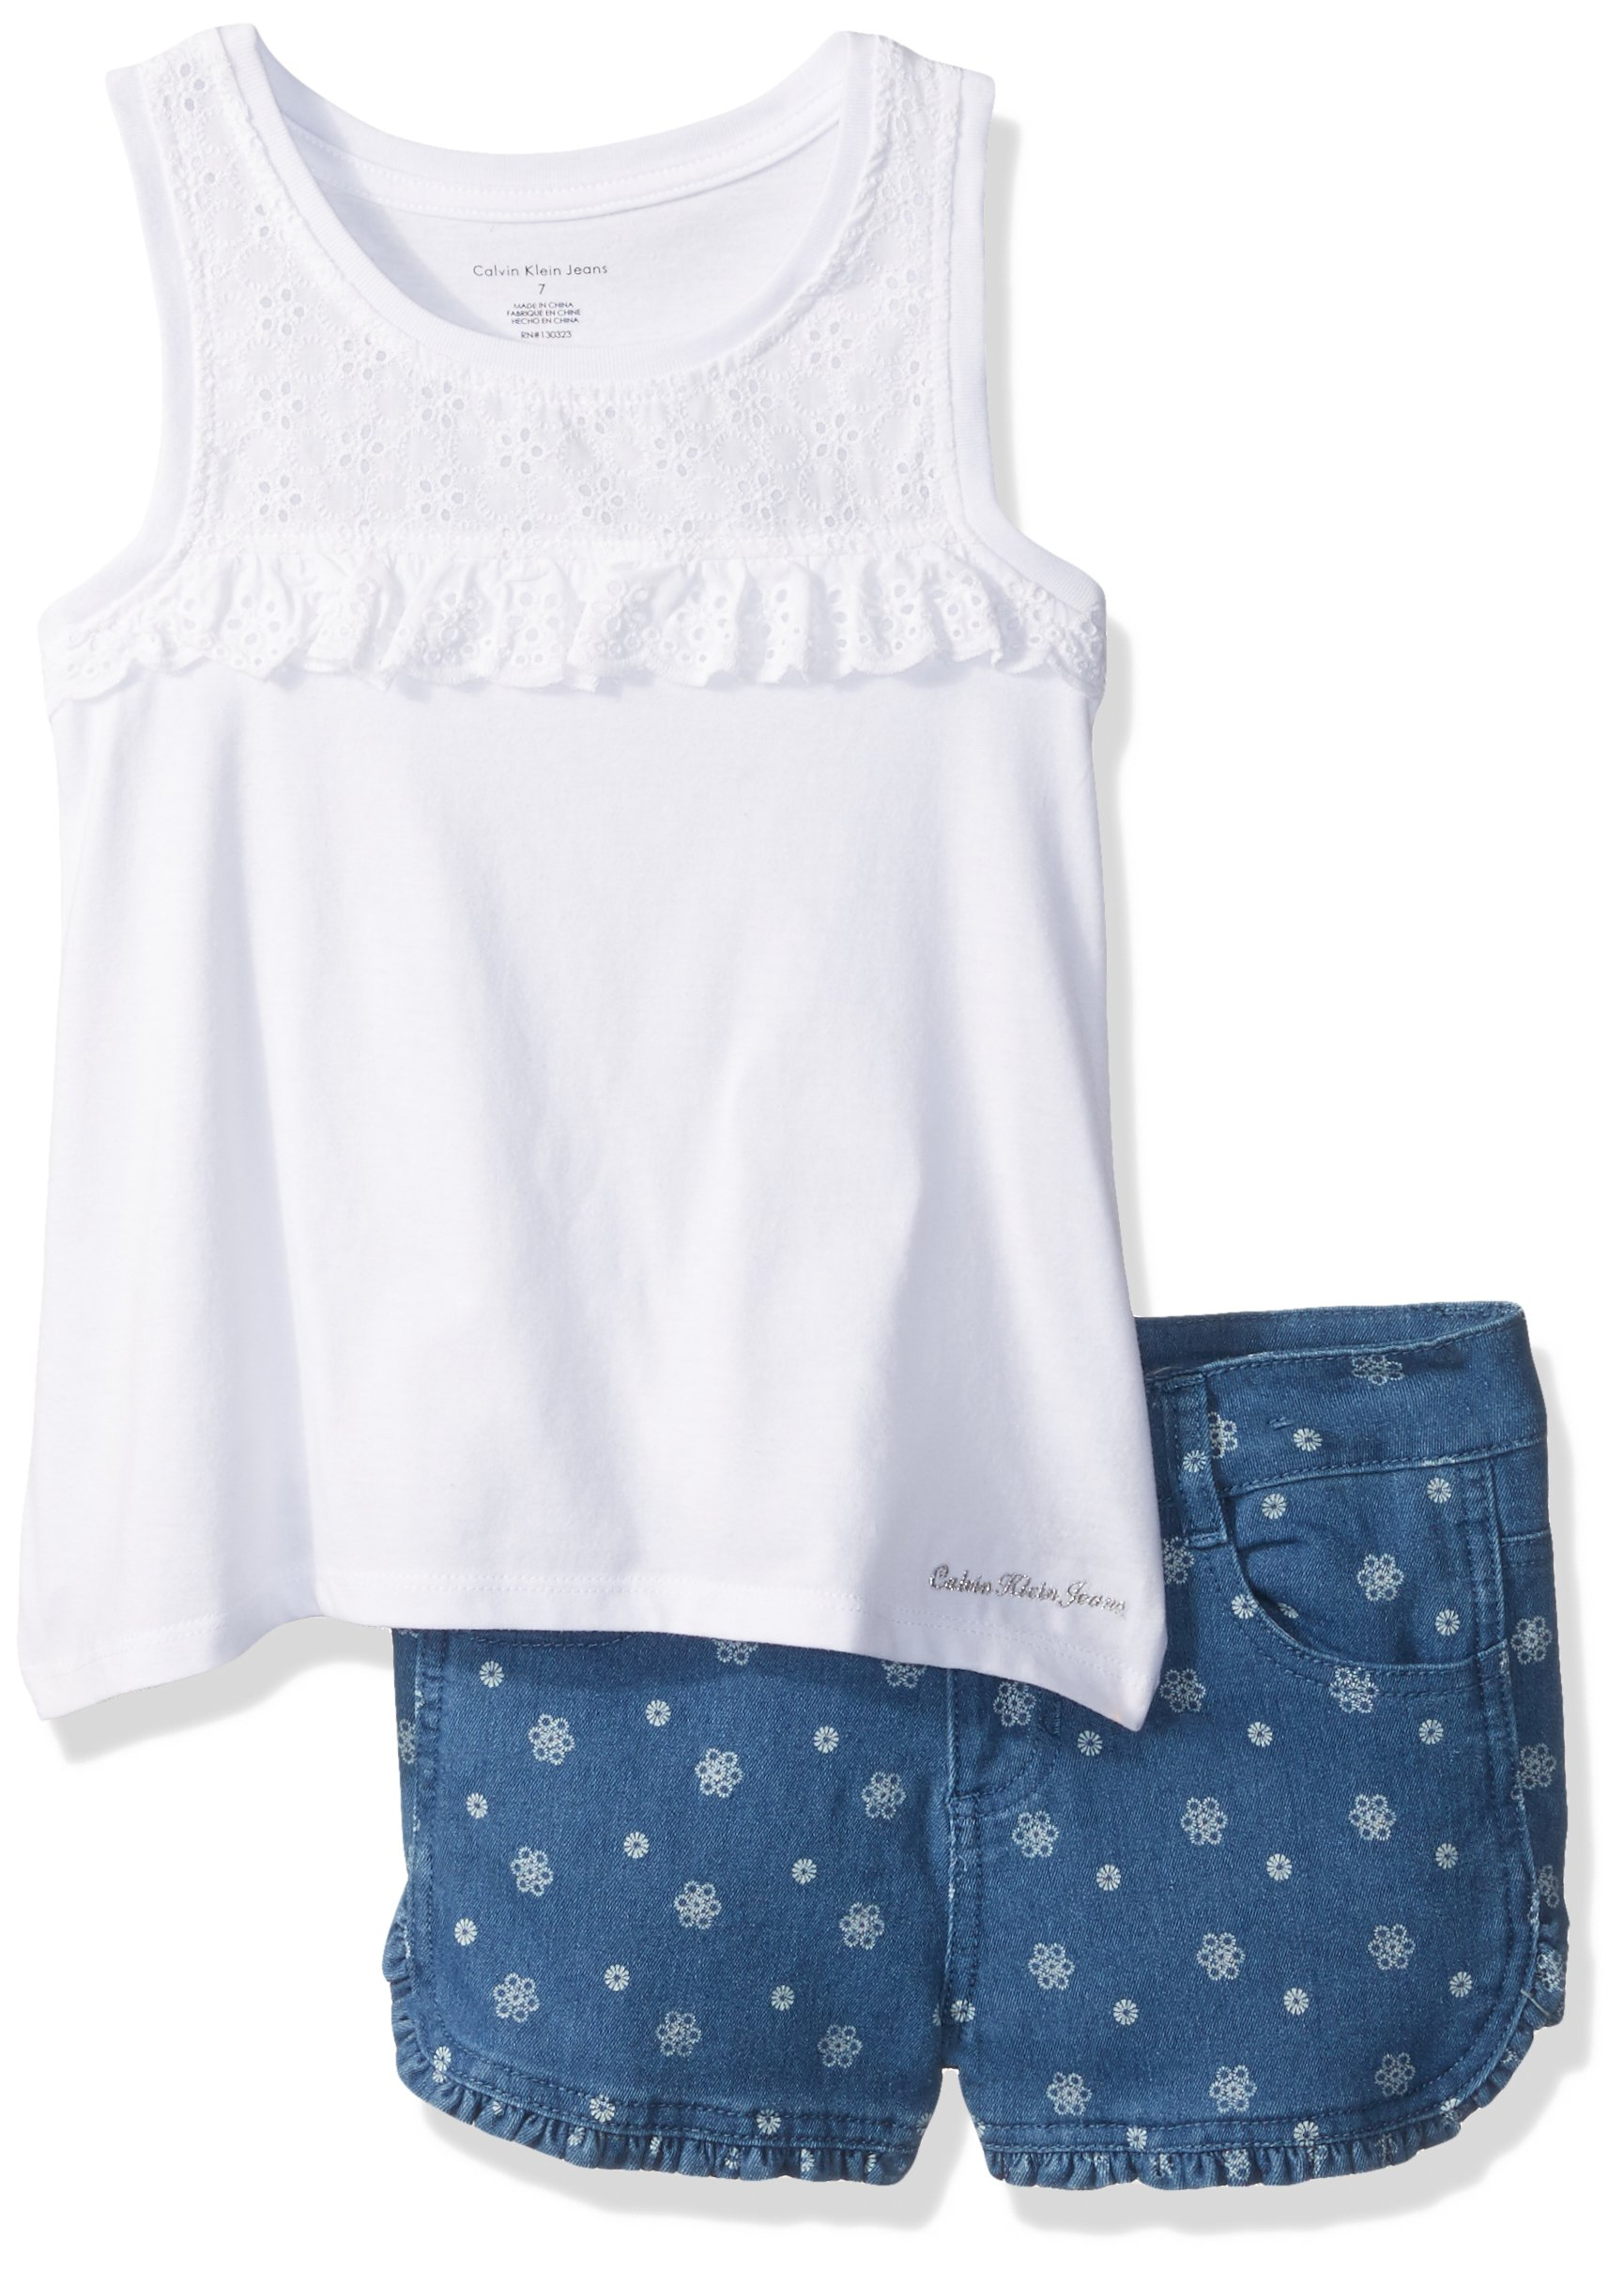 Calvin Klein Little Girls' 2 Pieces Jeans Short Sets, White, 5